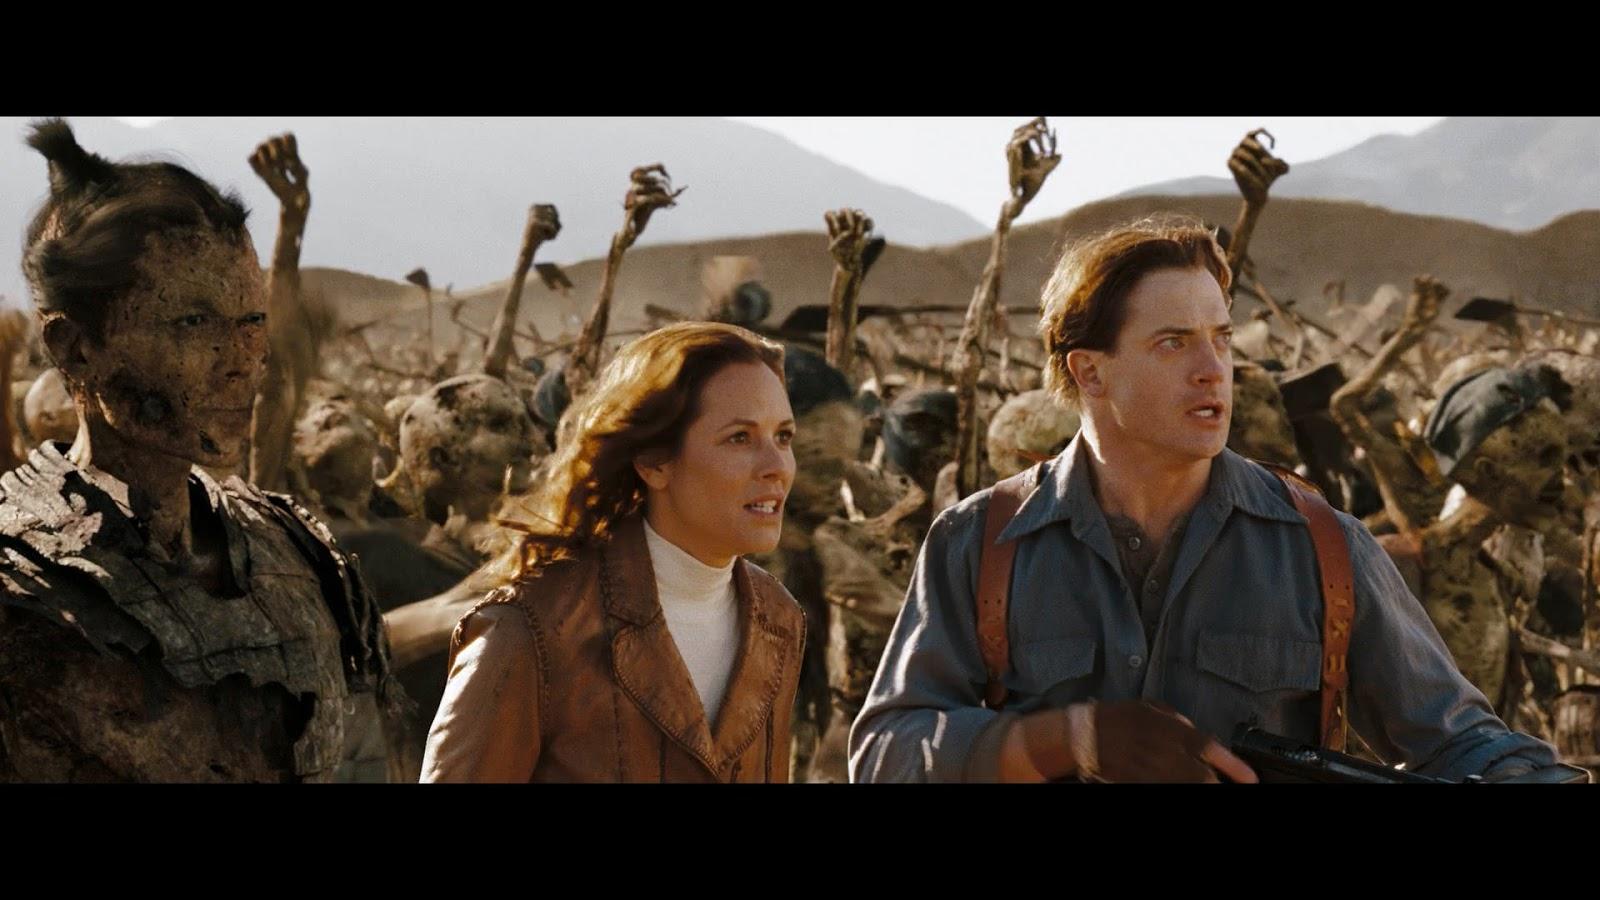 La Momia: La Tumba del Emperador Dragón (2008) Full HD 1080p Latino - Ingles captura 4